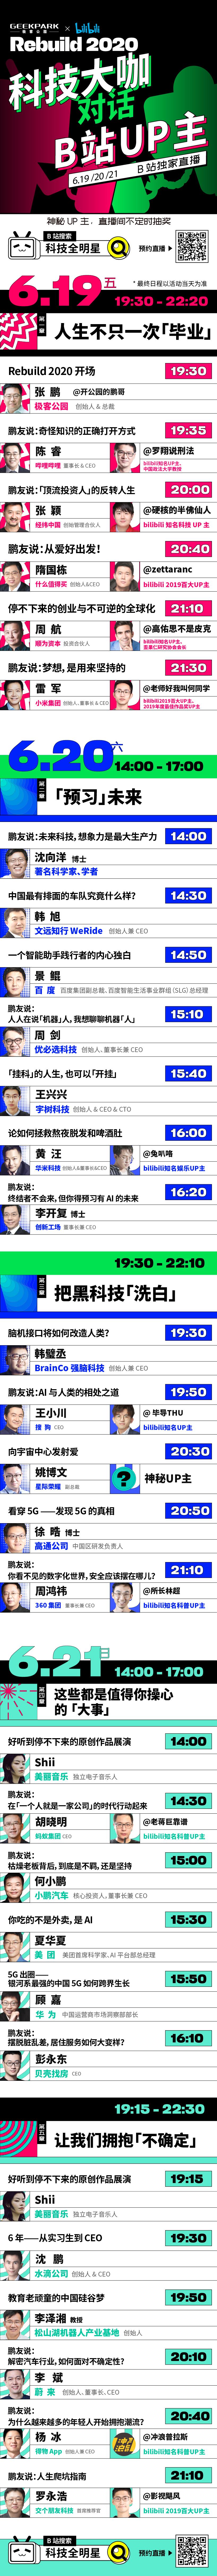 B站科技大咖直播Rebuild2020-bilibili-『游乐宫』Youlegong.com 第2张